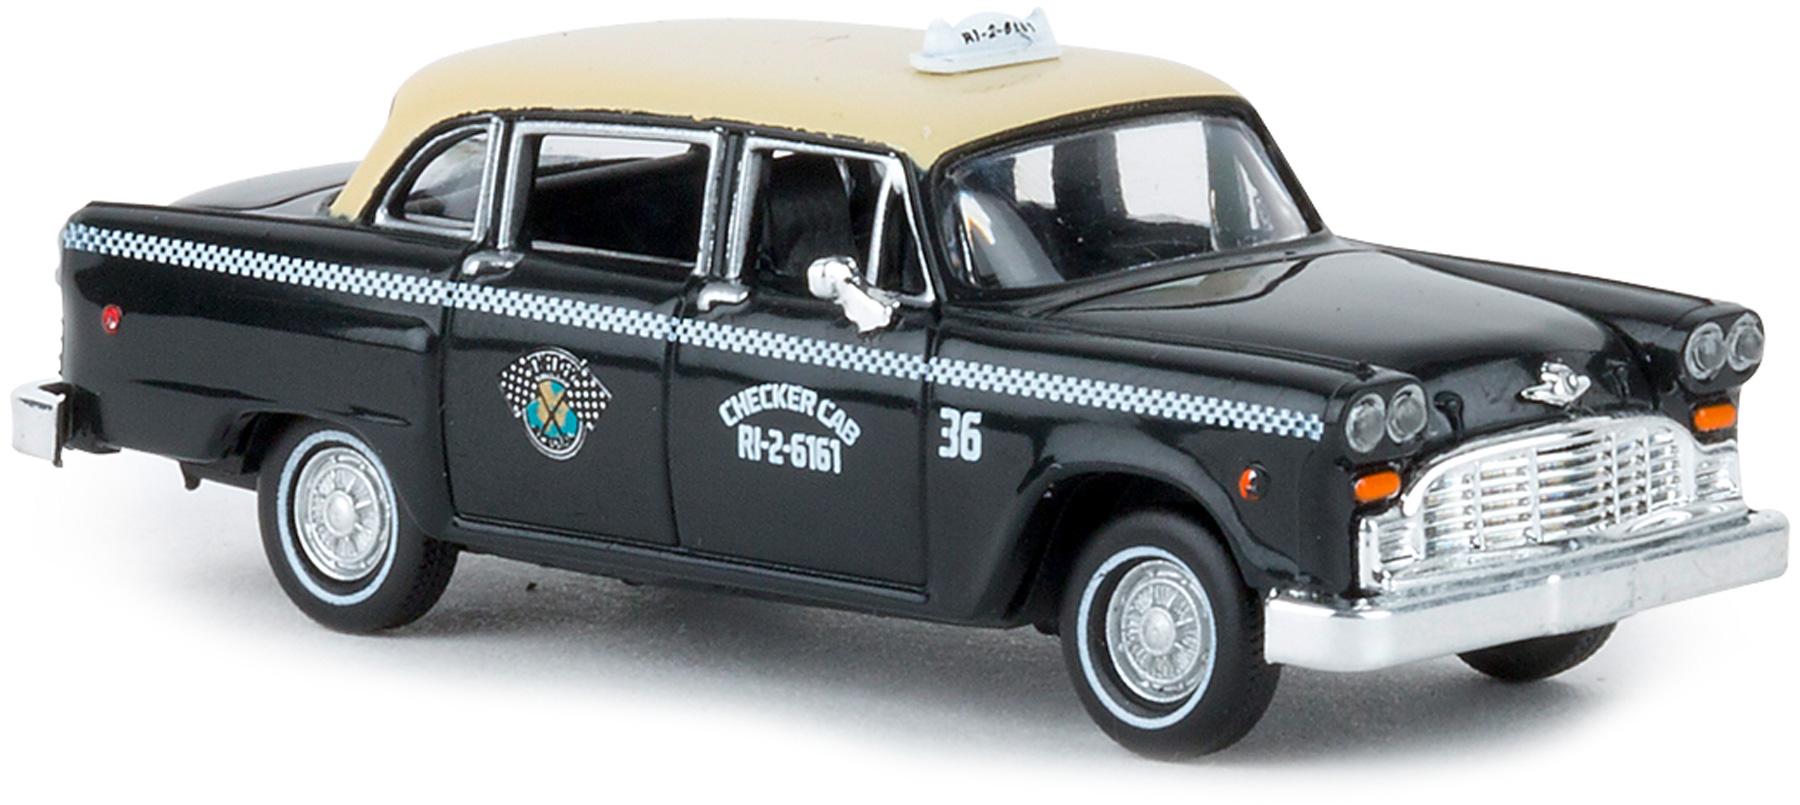 Brekina 58927 Checker Cab